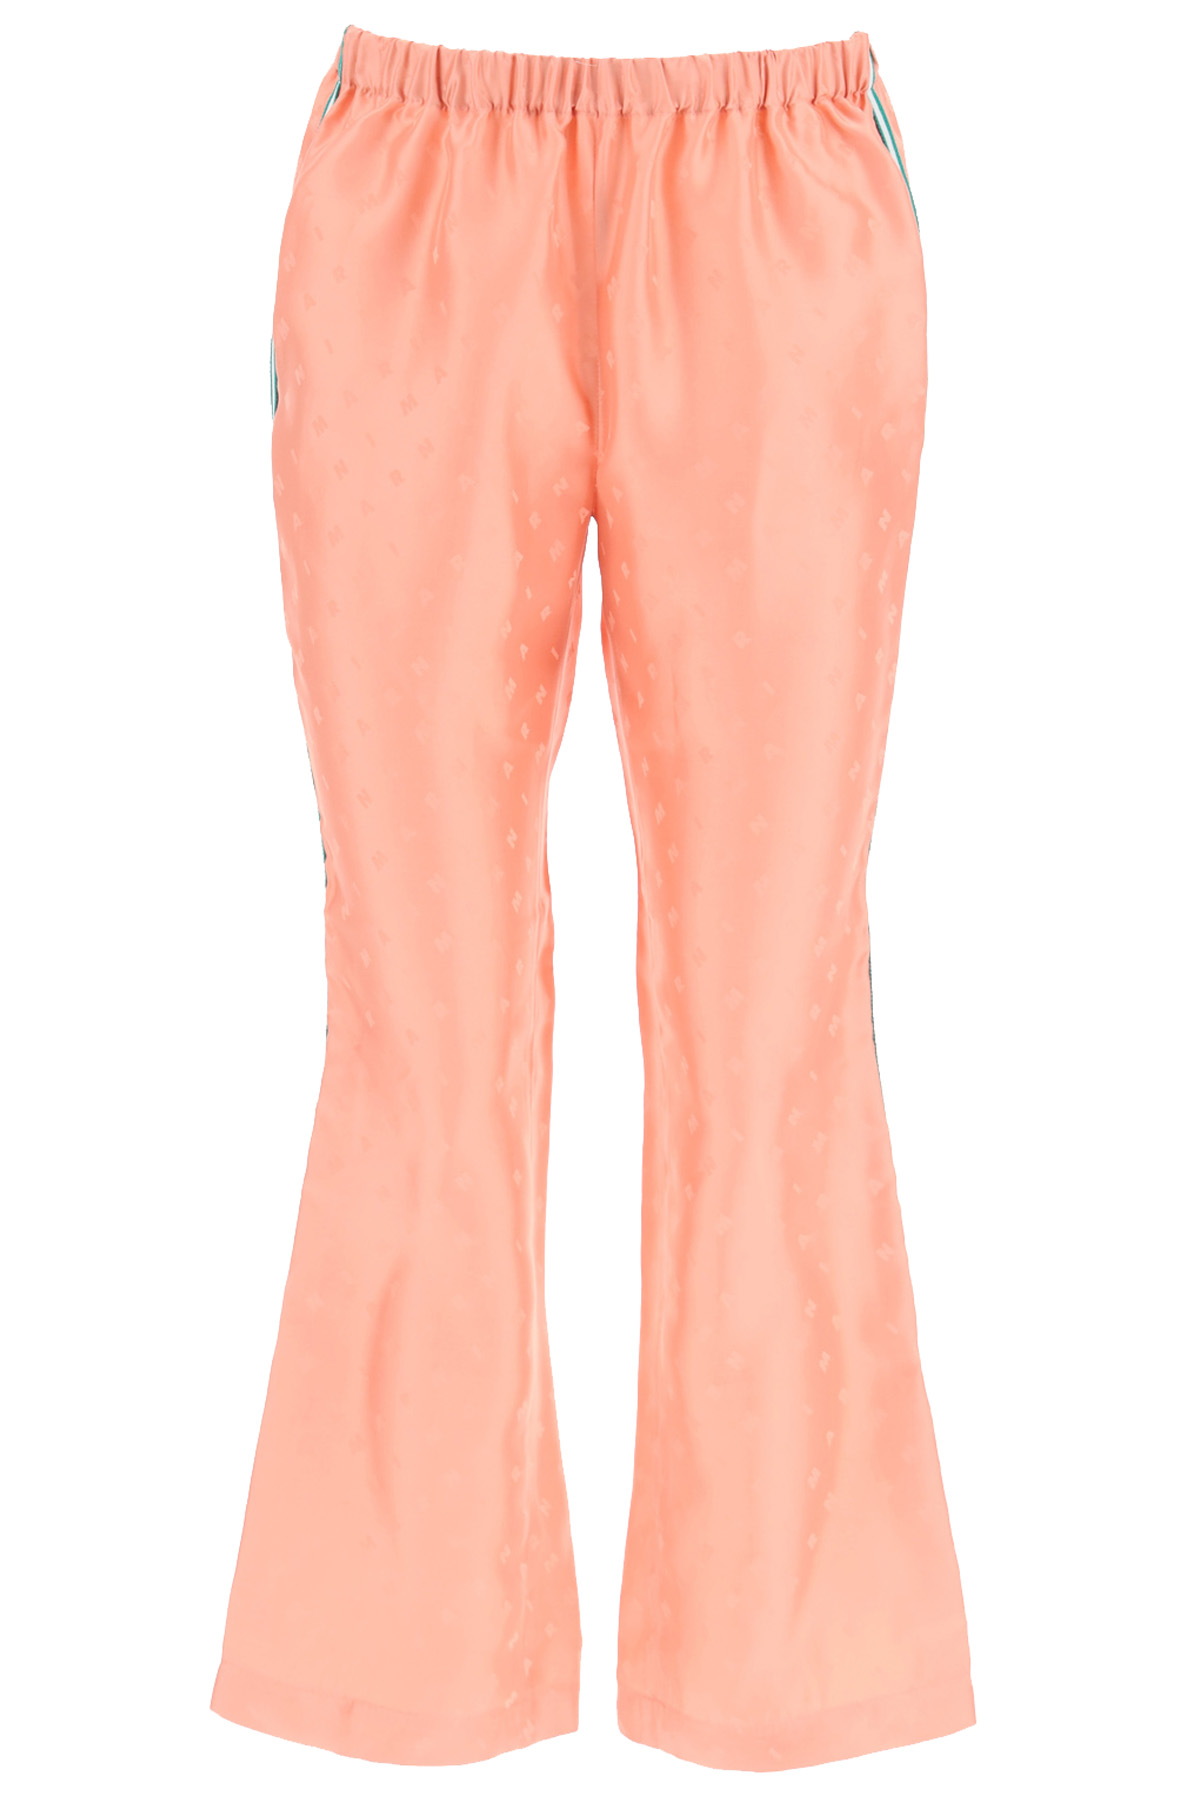 Marni pantalone jacquard